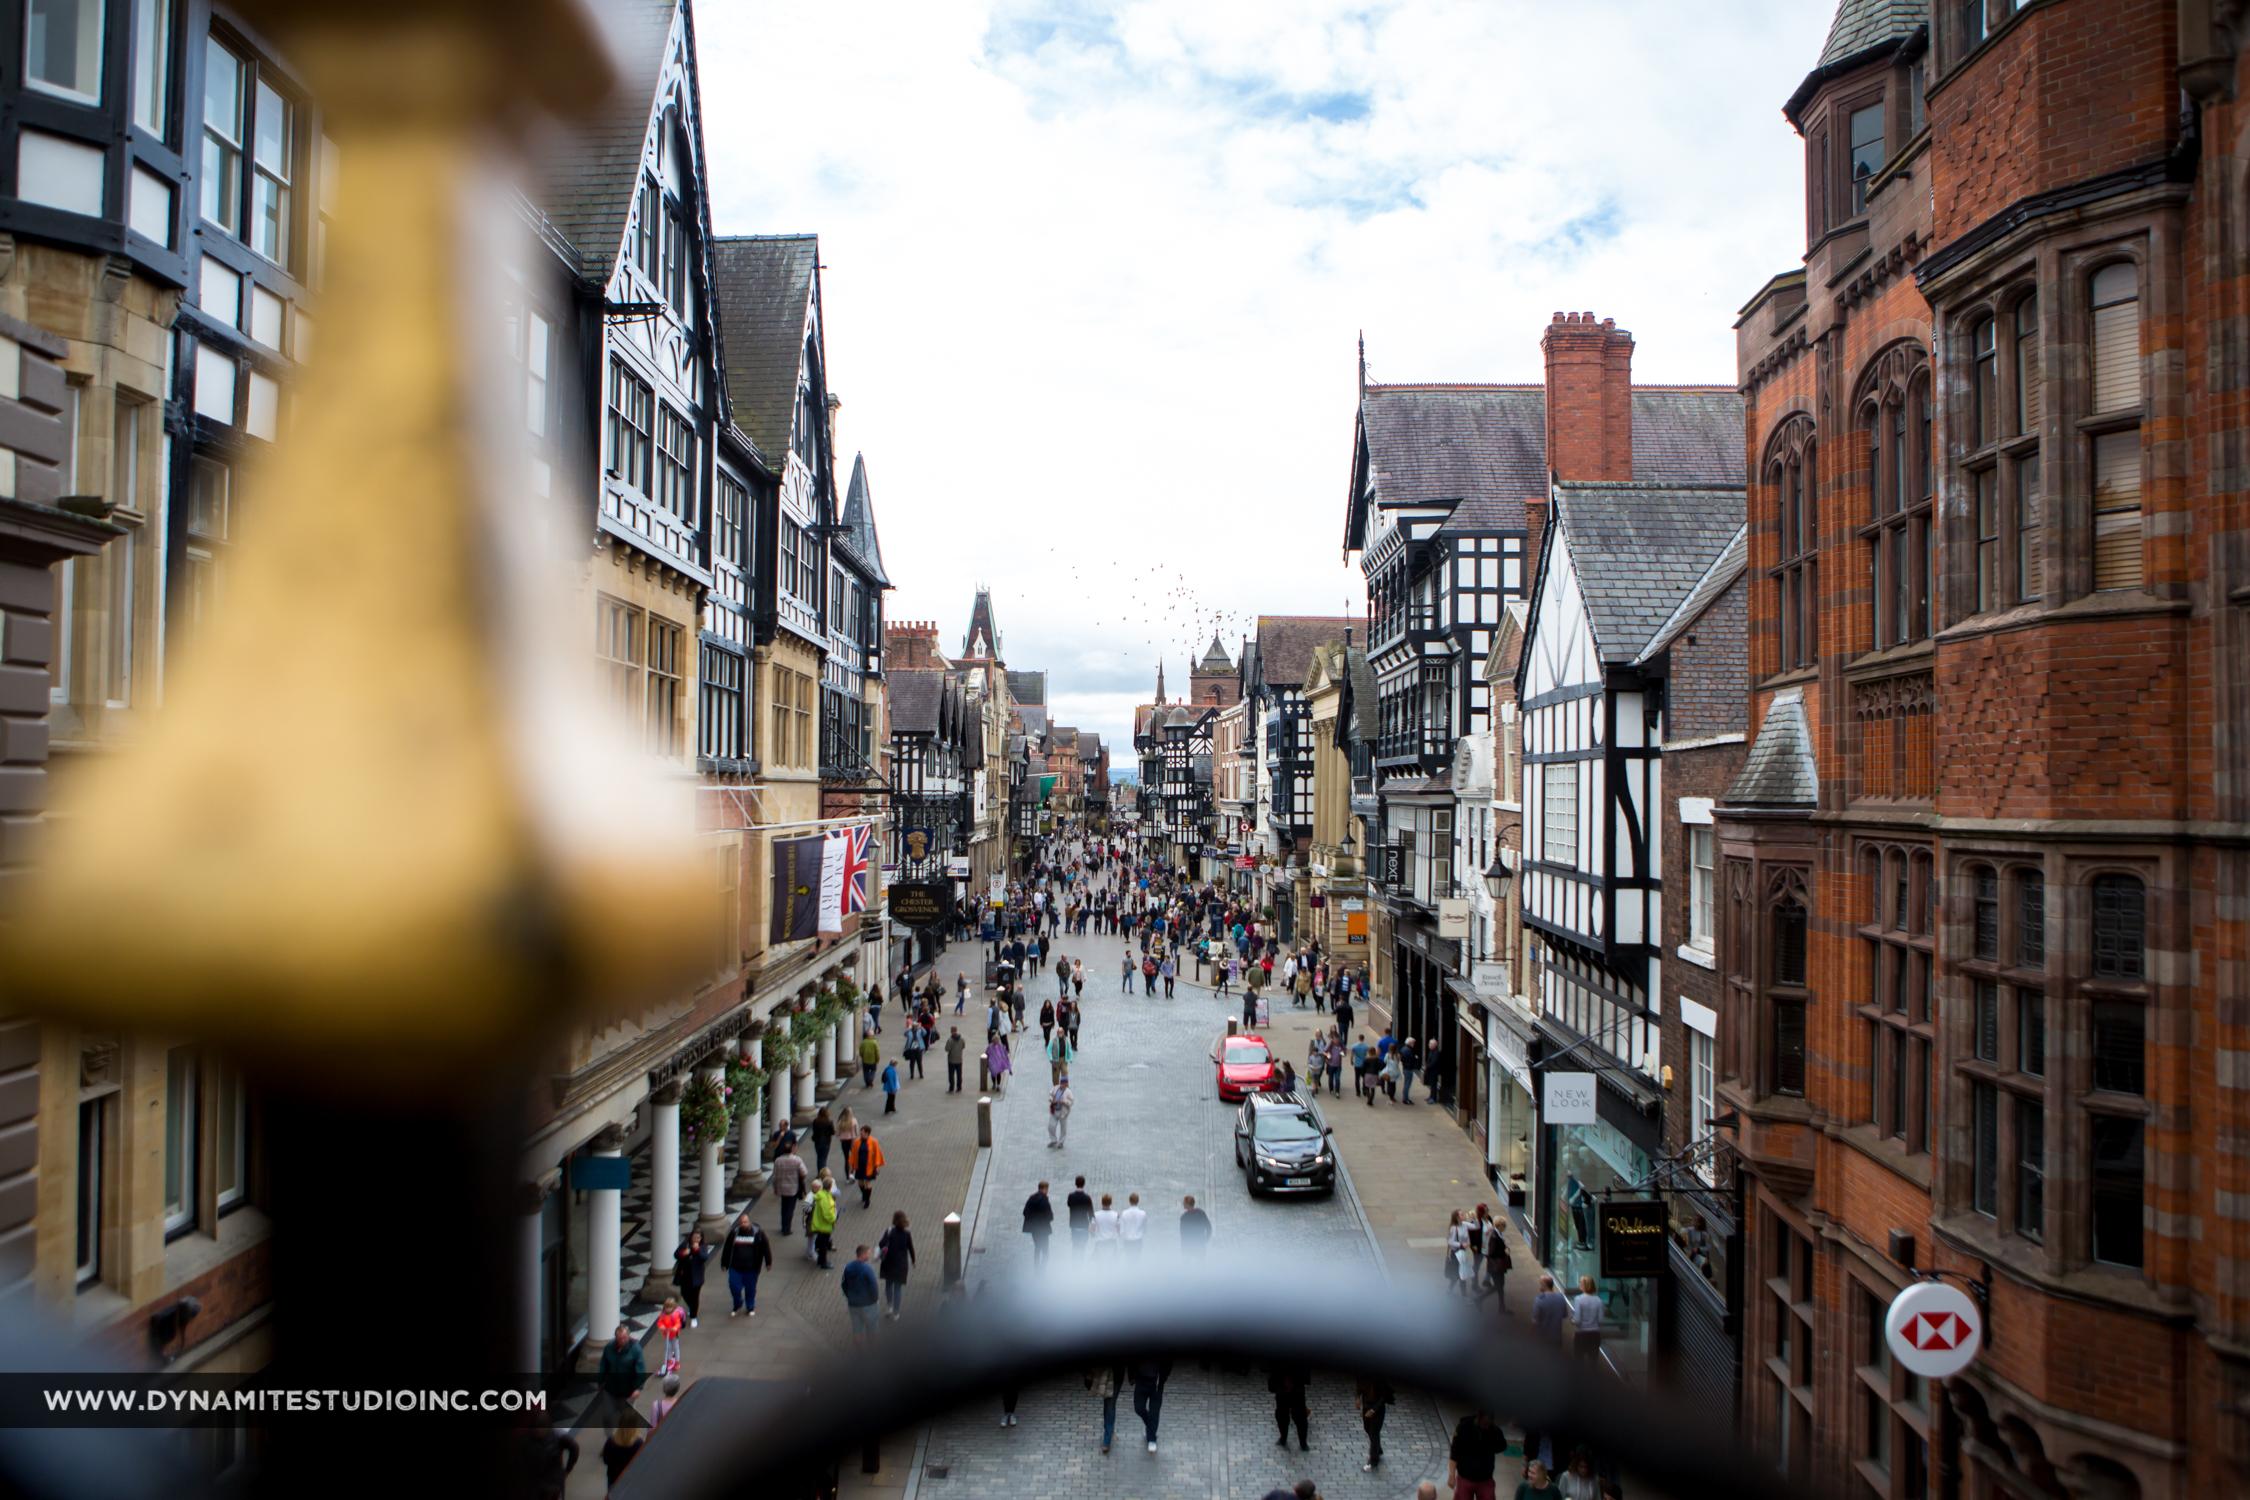 www.dynamitestudioinc.com-chester-england-travel-photography-orlando-7.jpg